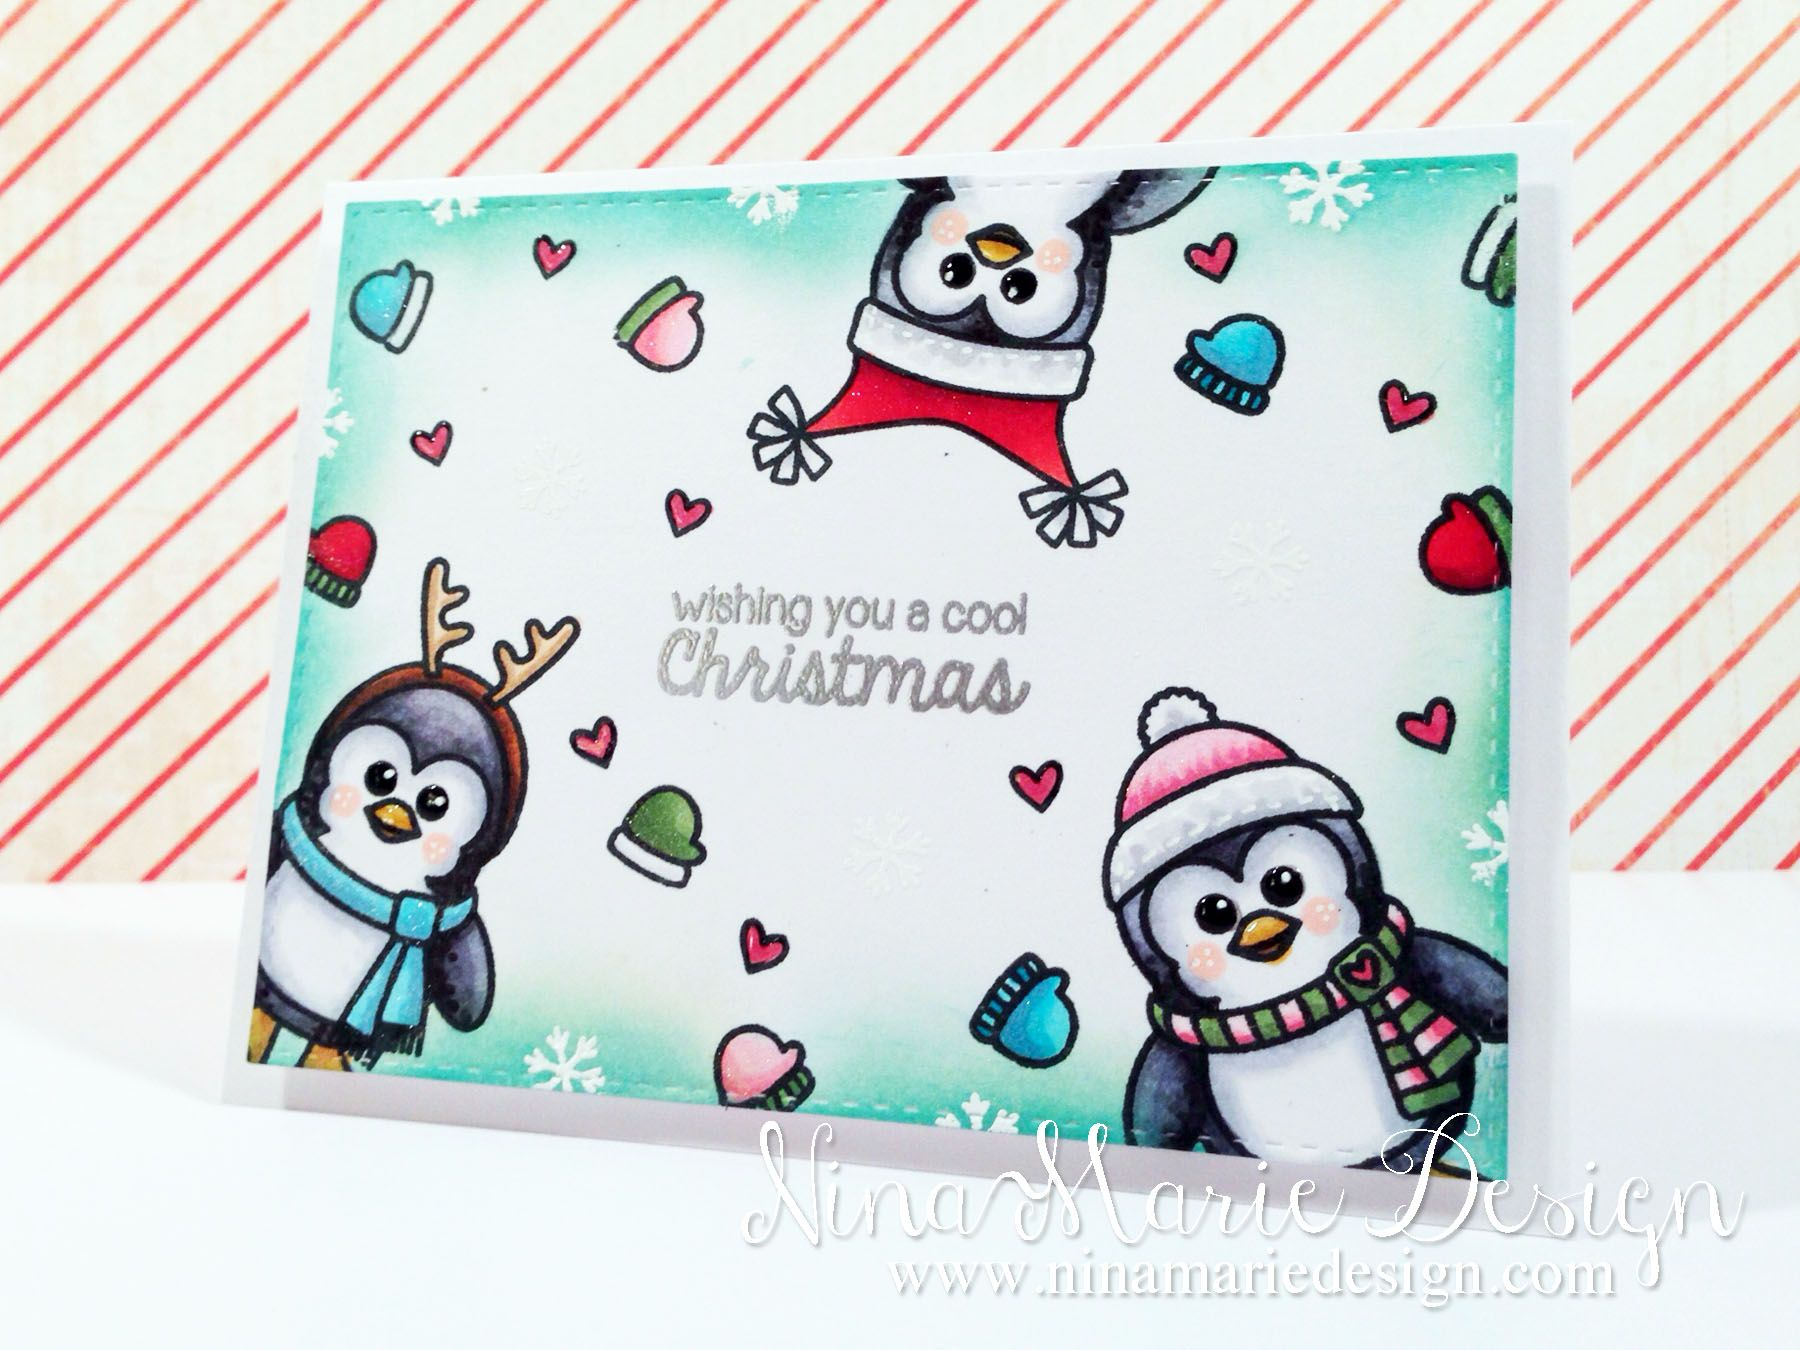 Sunny Studio Bundled Up Cool Christmas Wishes Penguin Christmas